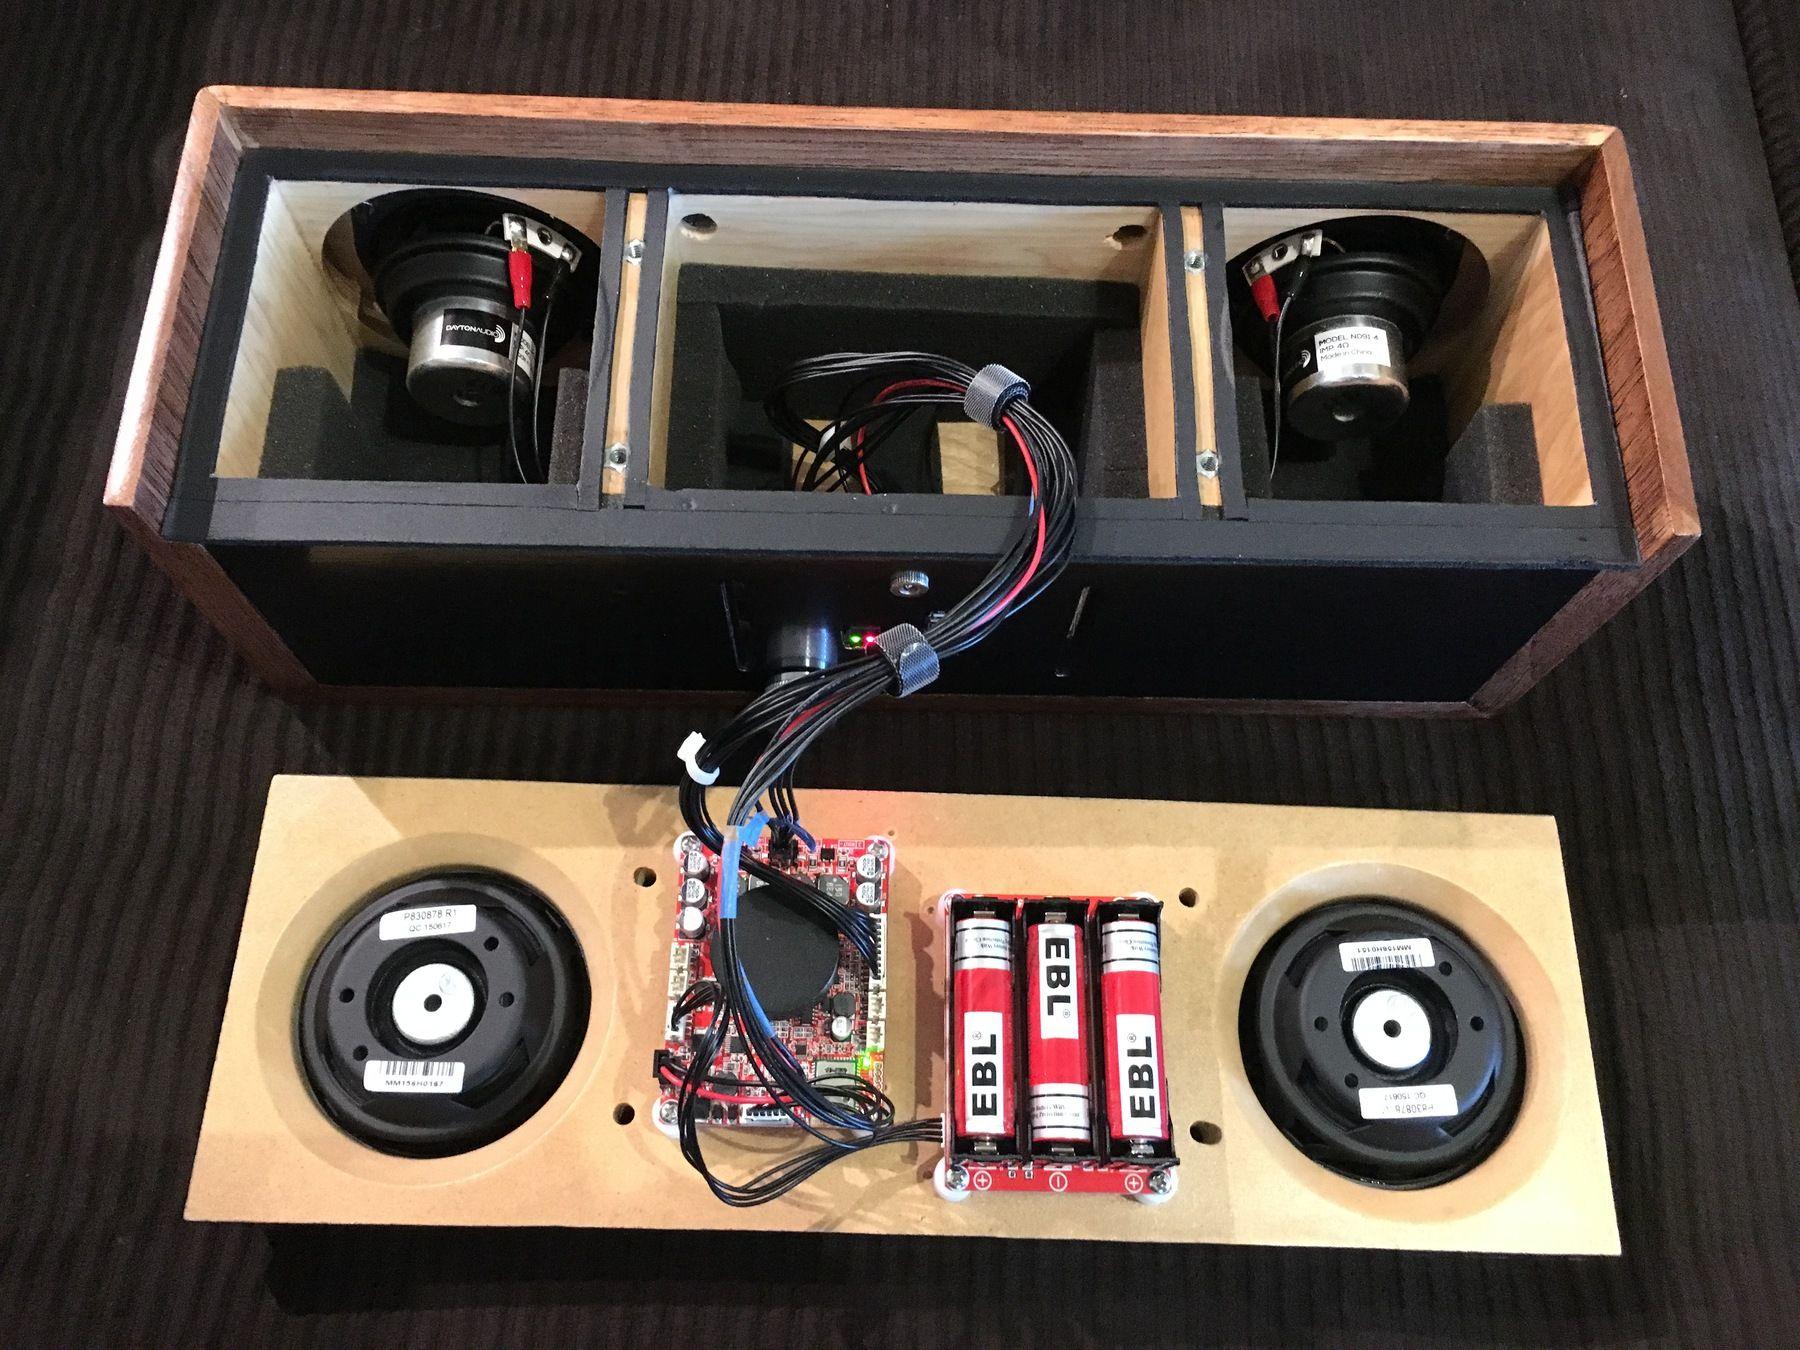 medium resolution of dayton audio kab 250 2x50w class d audio amplifier board with bluetooth 4 0